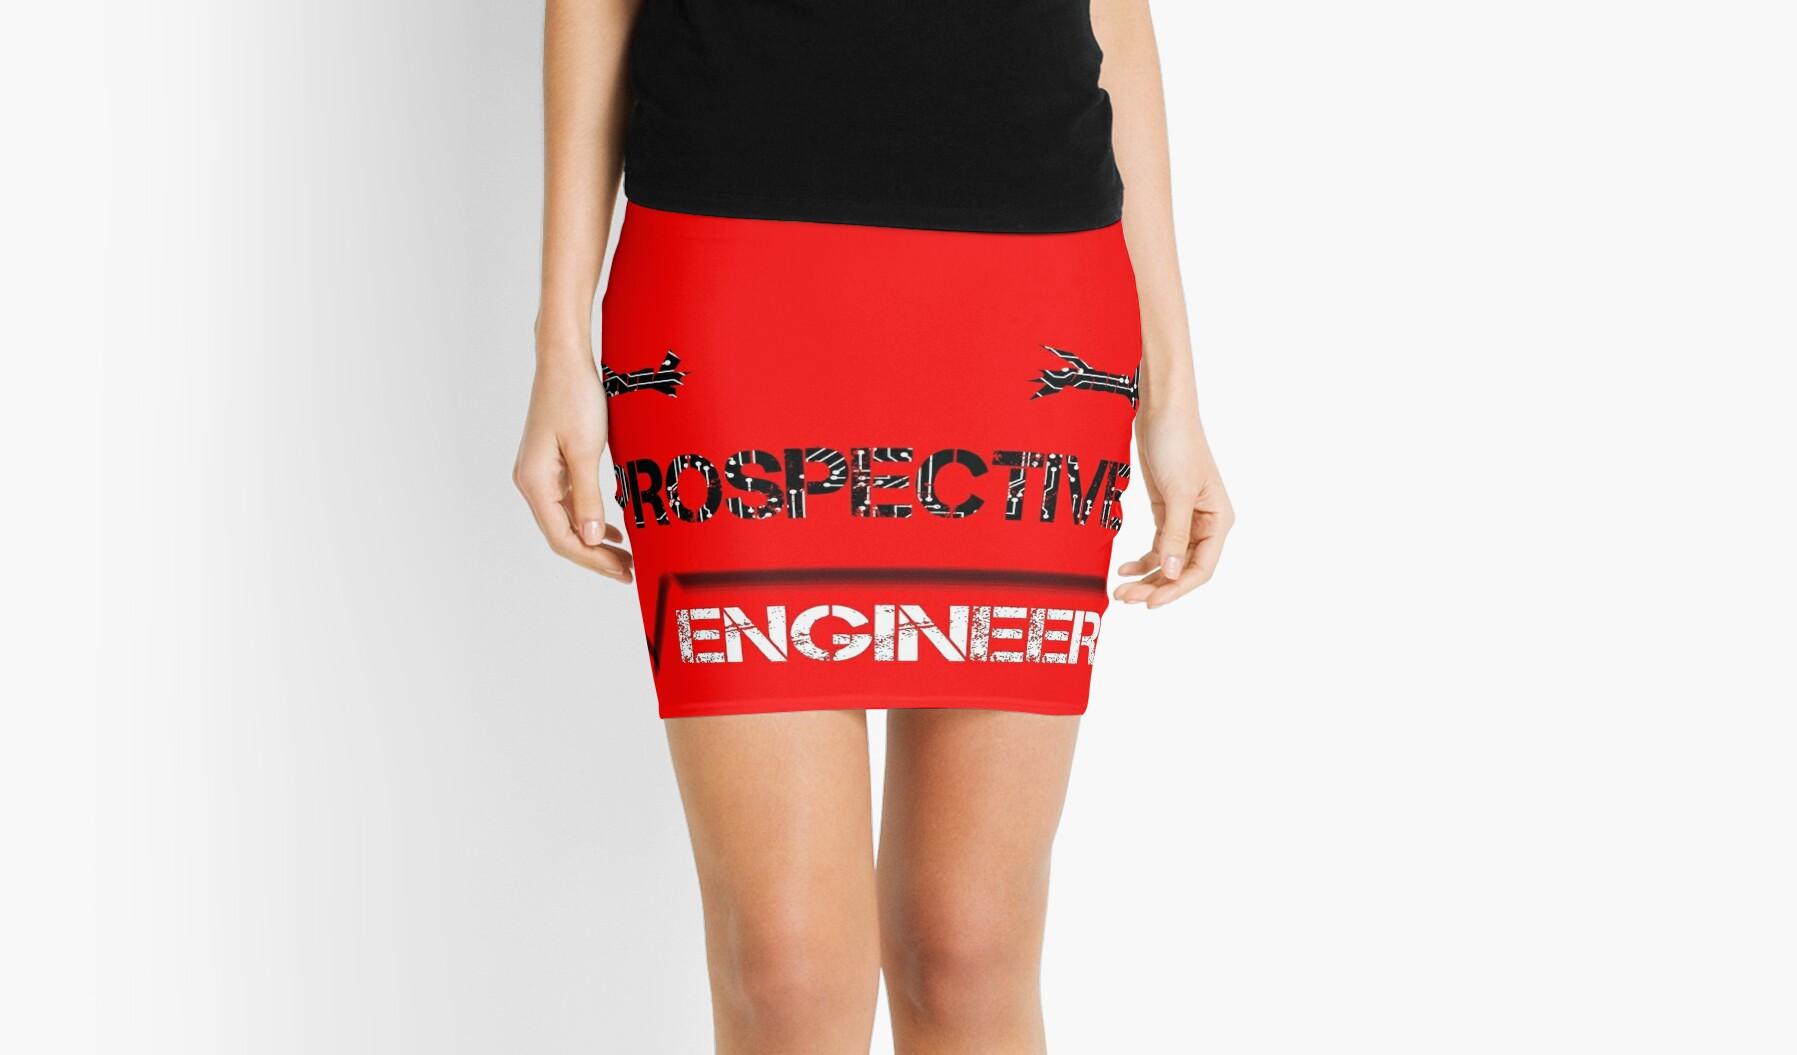 Prospective Engineer by Mazeazia